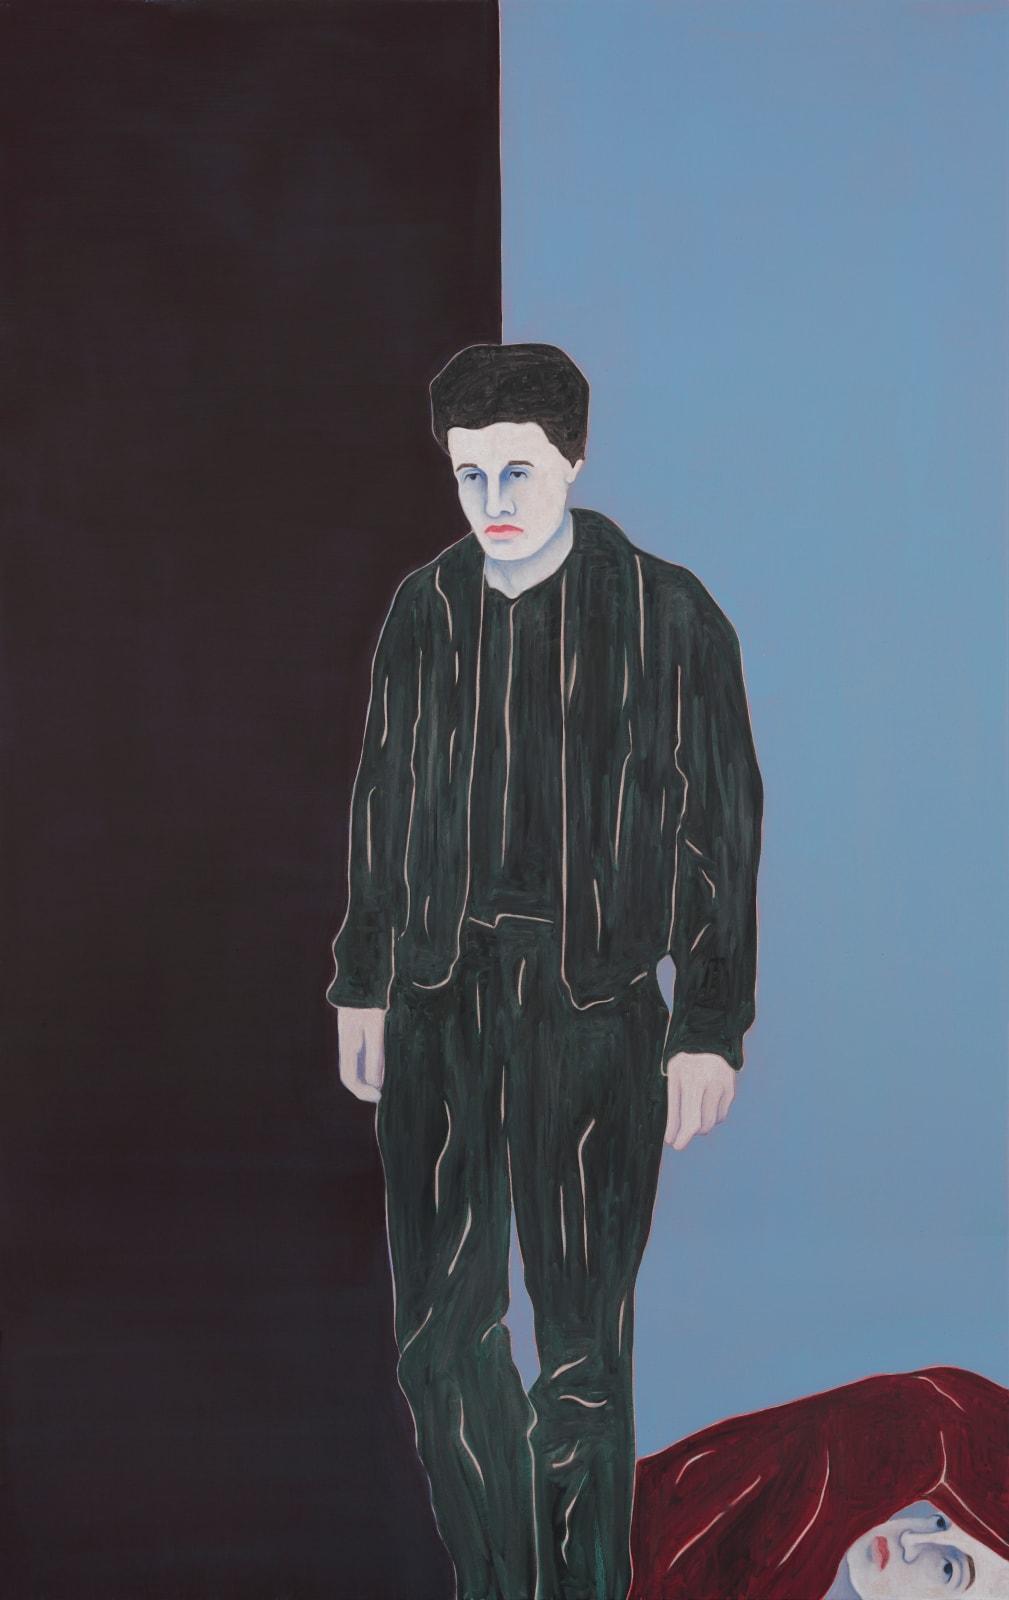 Djamel Tatah, Untitled, 2018